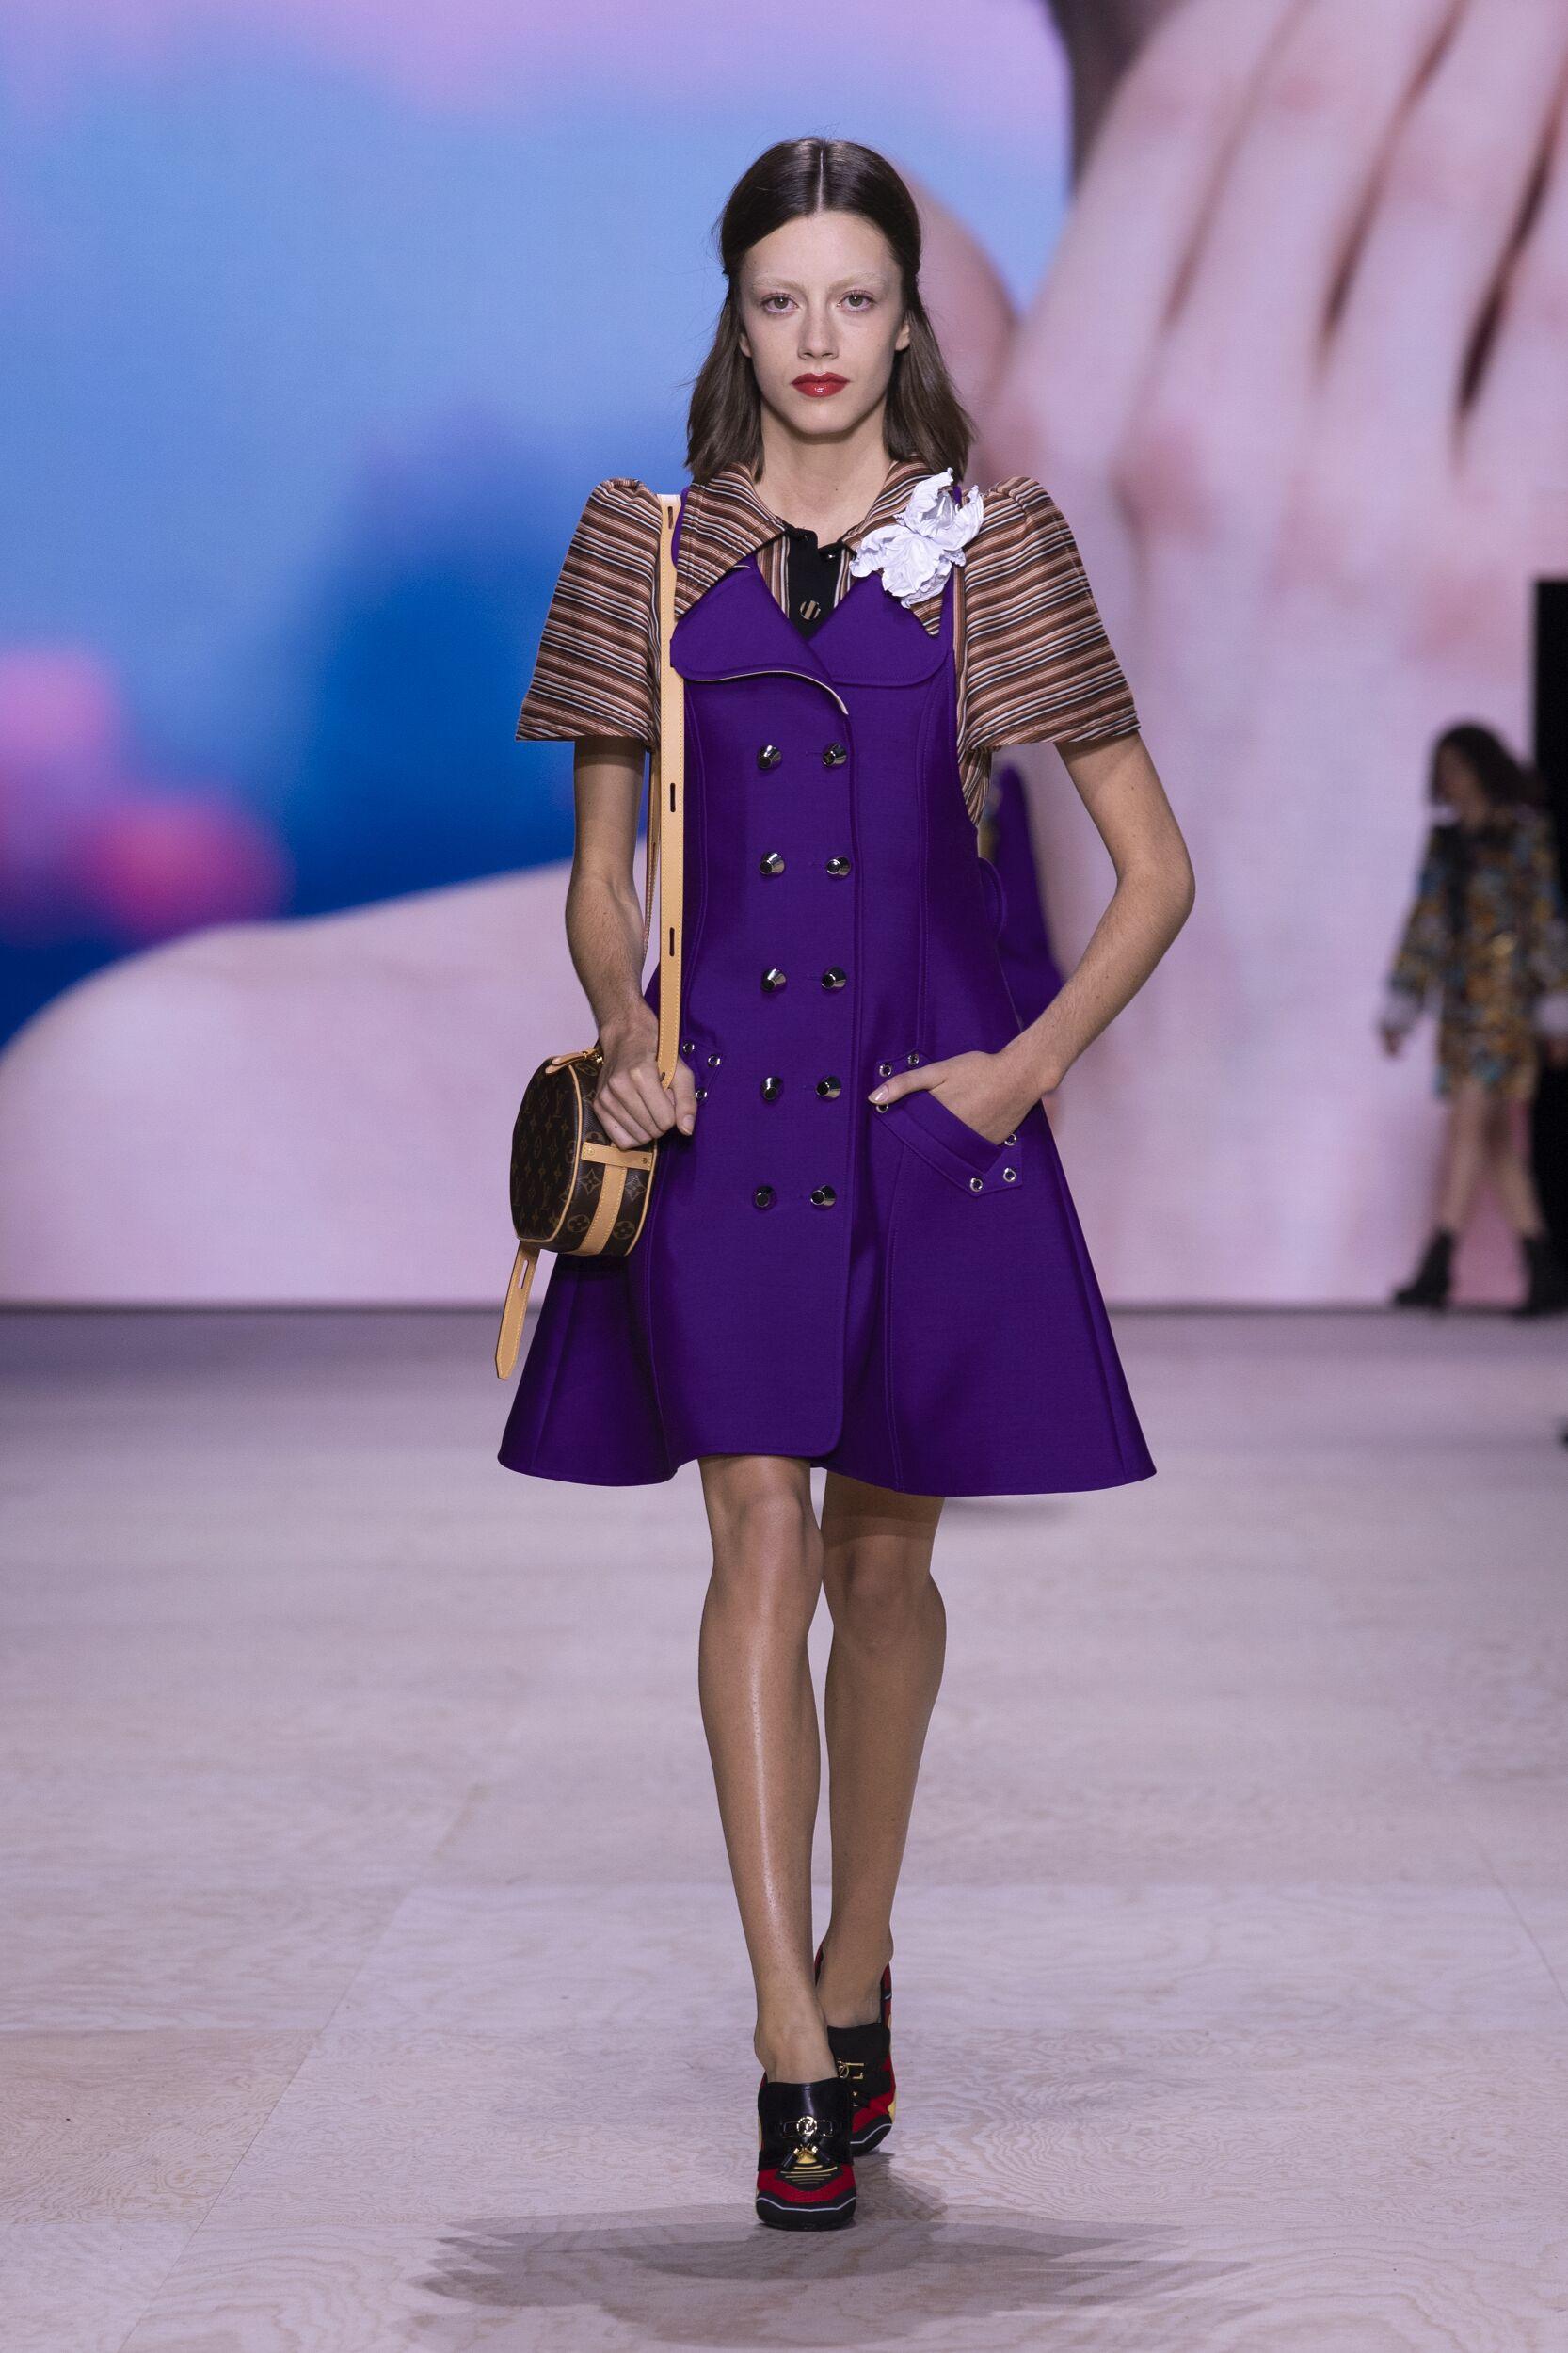 Catwalk Louis Vuitton Woman Fashion Show Summer 2020